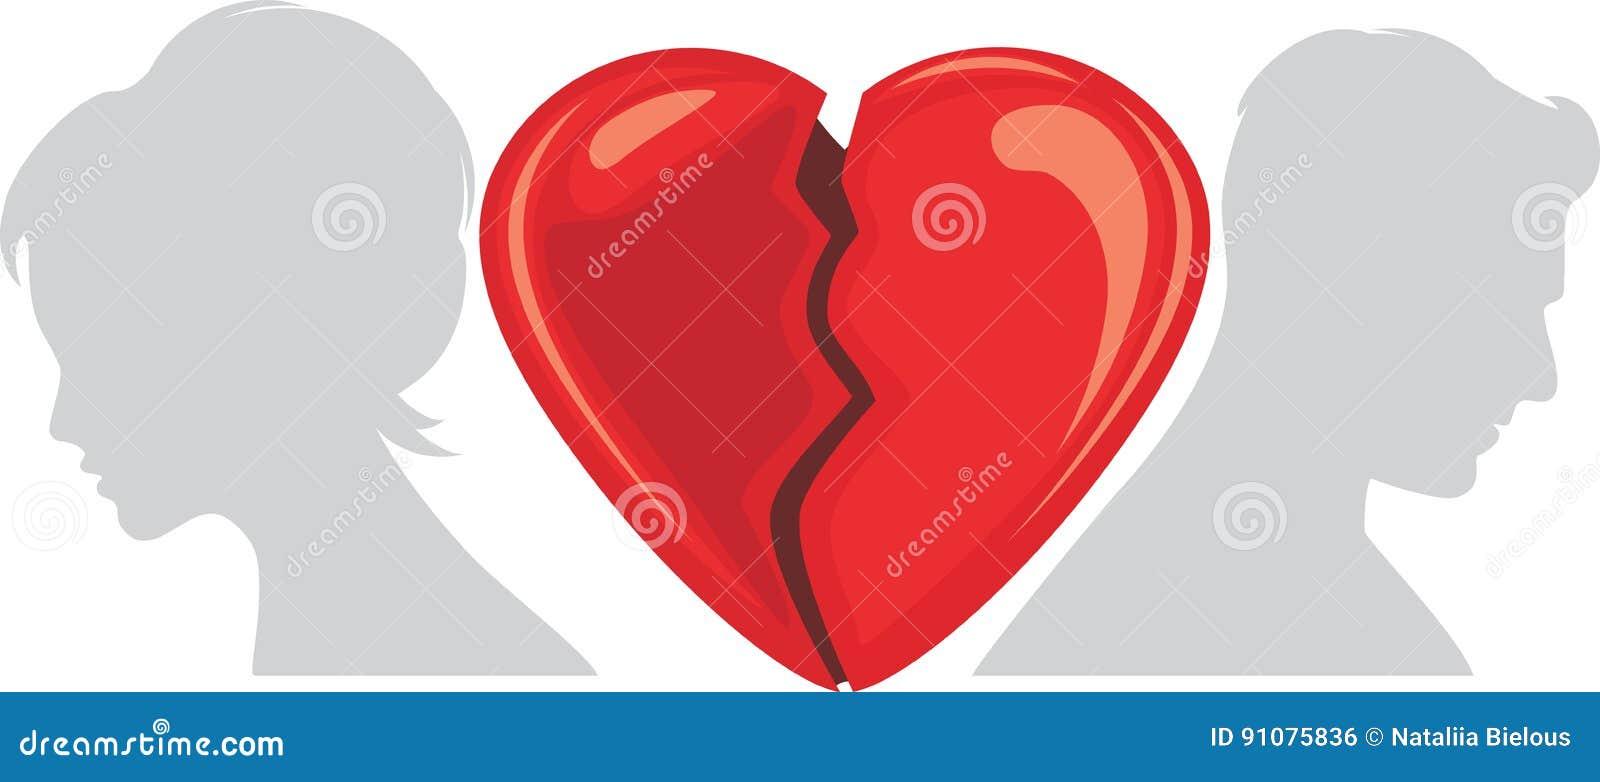 Broken Heart Stock Vector Illustration Of Feeling Beautiful 91075836